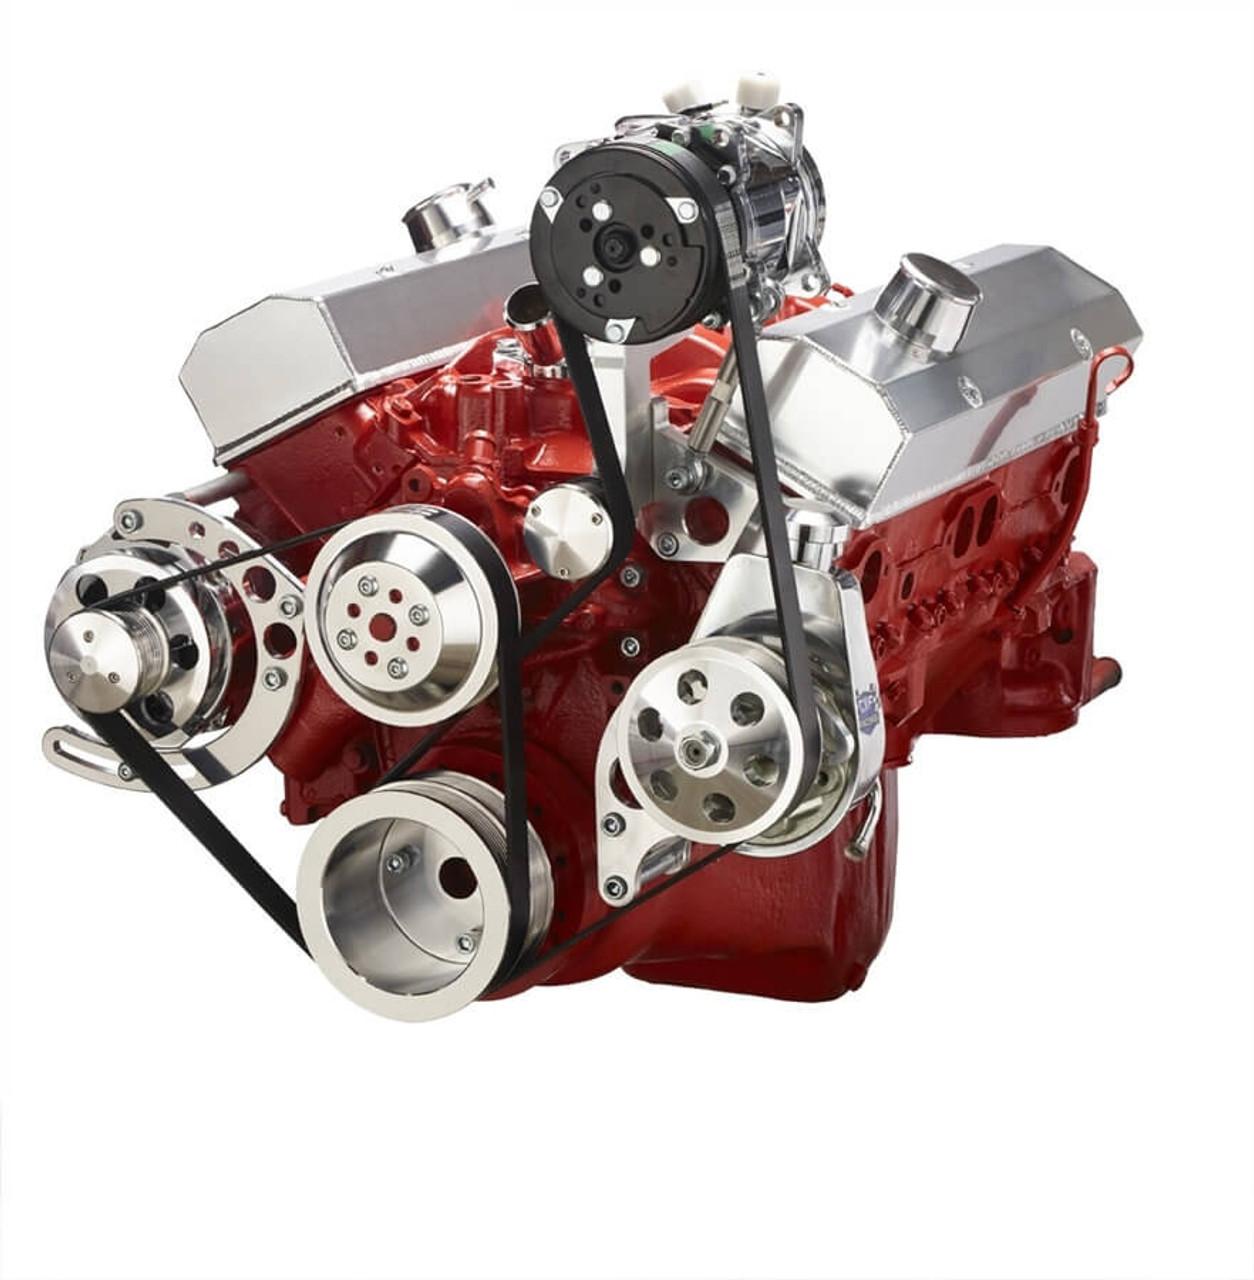 Chevy Small Block Serpentine Conversion - AC, Alternator & Power Steering,  Long Water Pump